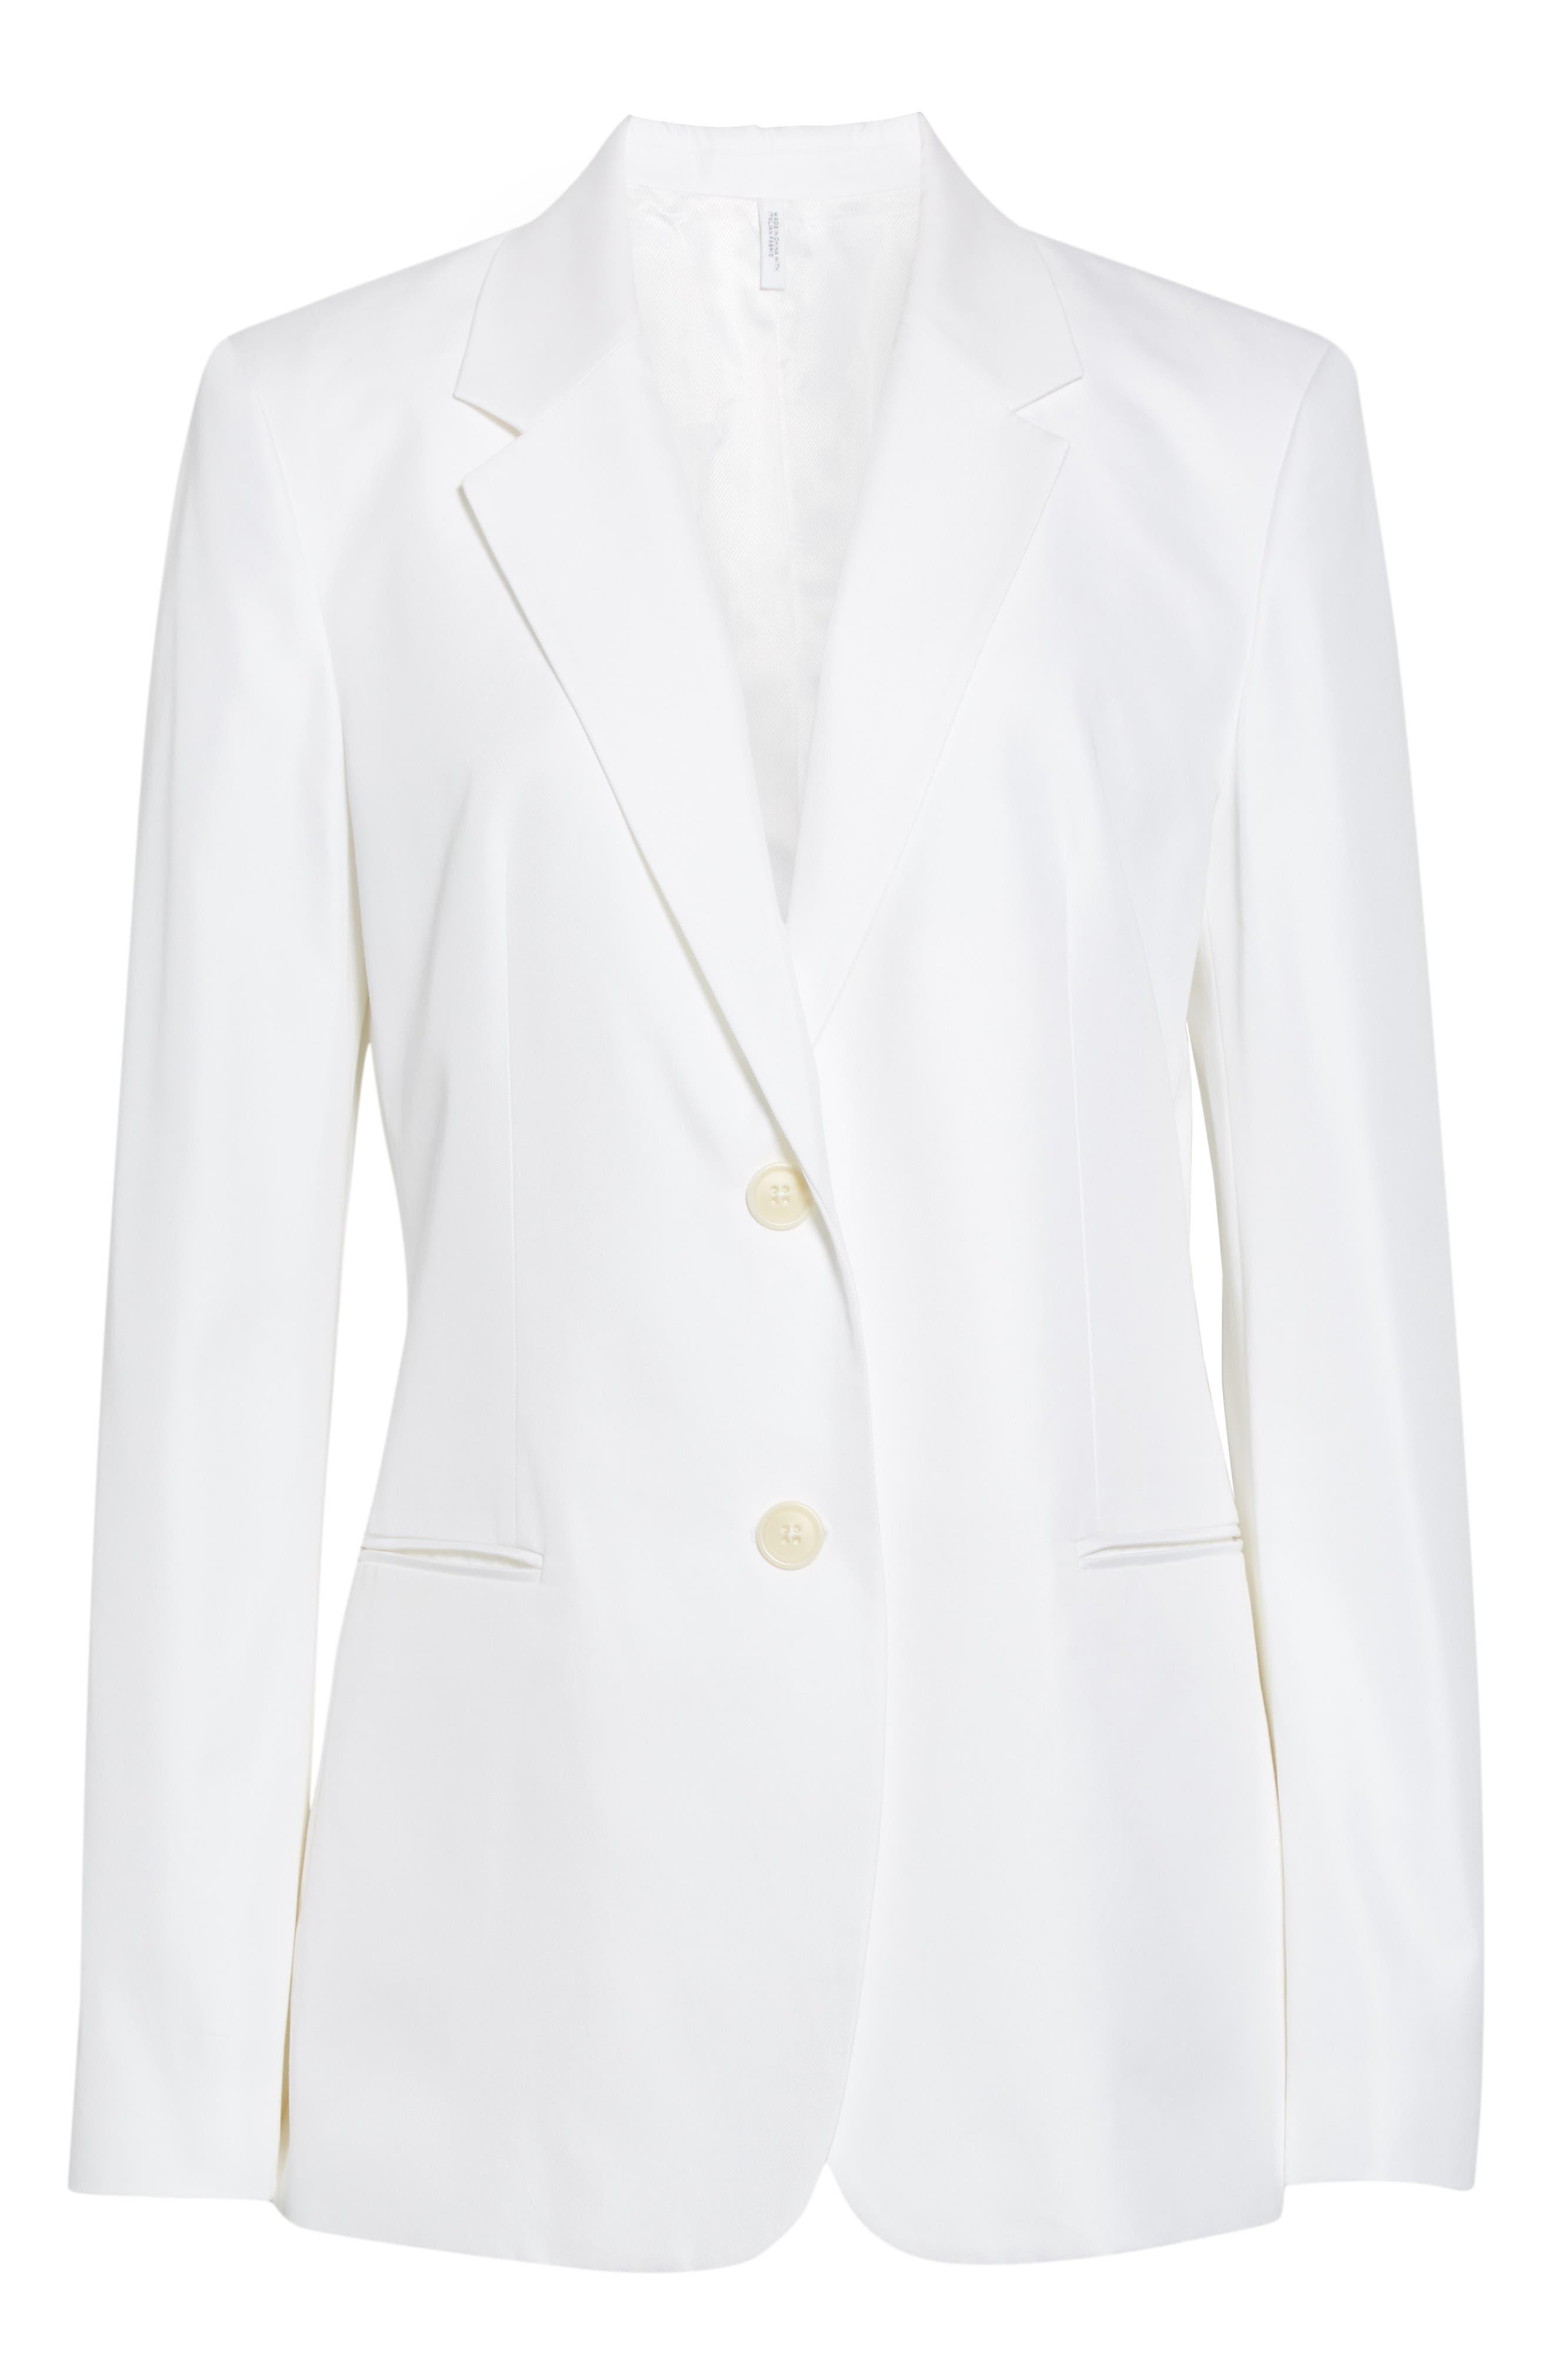 HELMUT LANG, Cotton Blend Blazer, Alternate thumbnail 6, color, WHITE